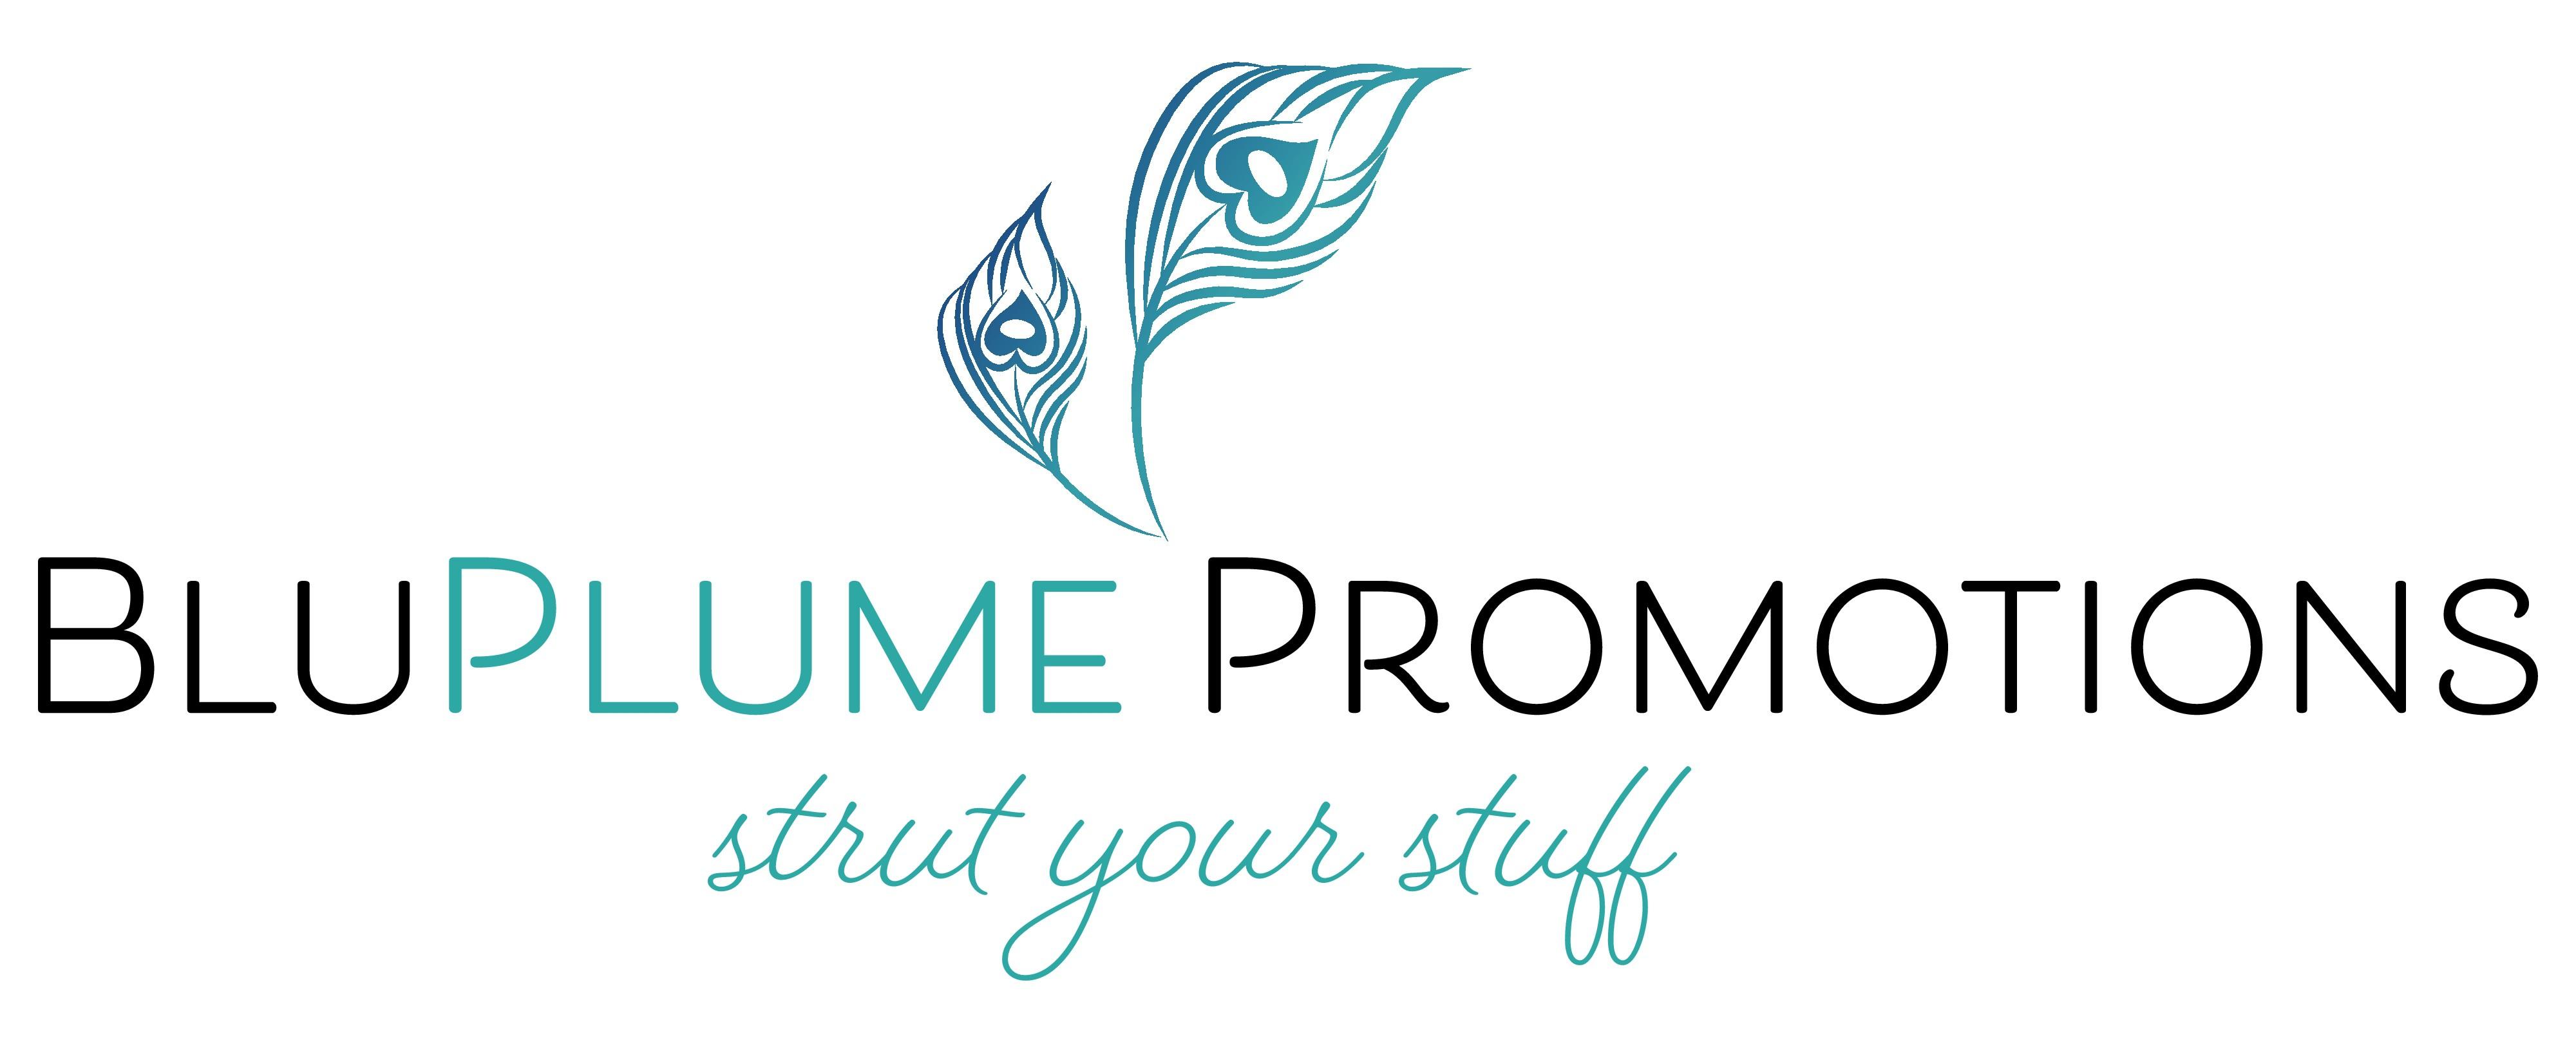 Create a captivating logo and website for a marketing company, BluPlume